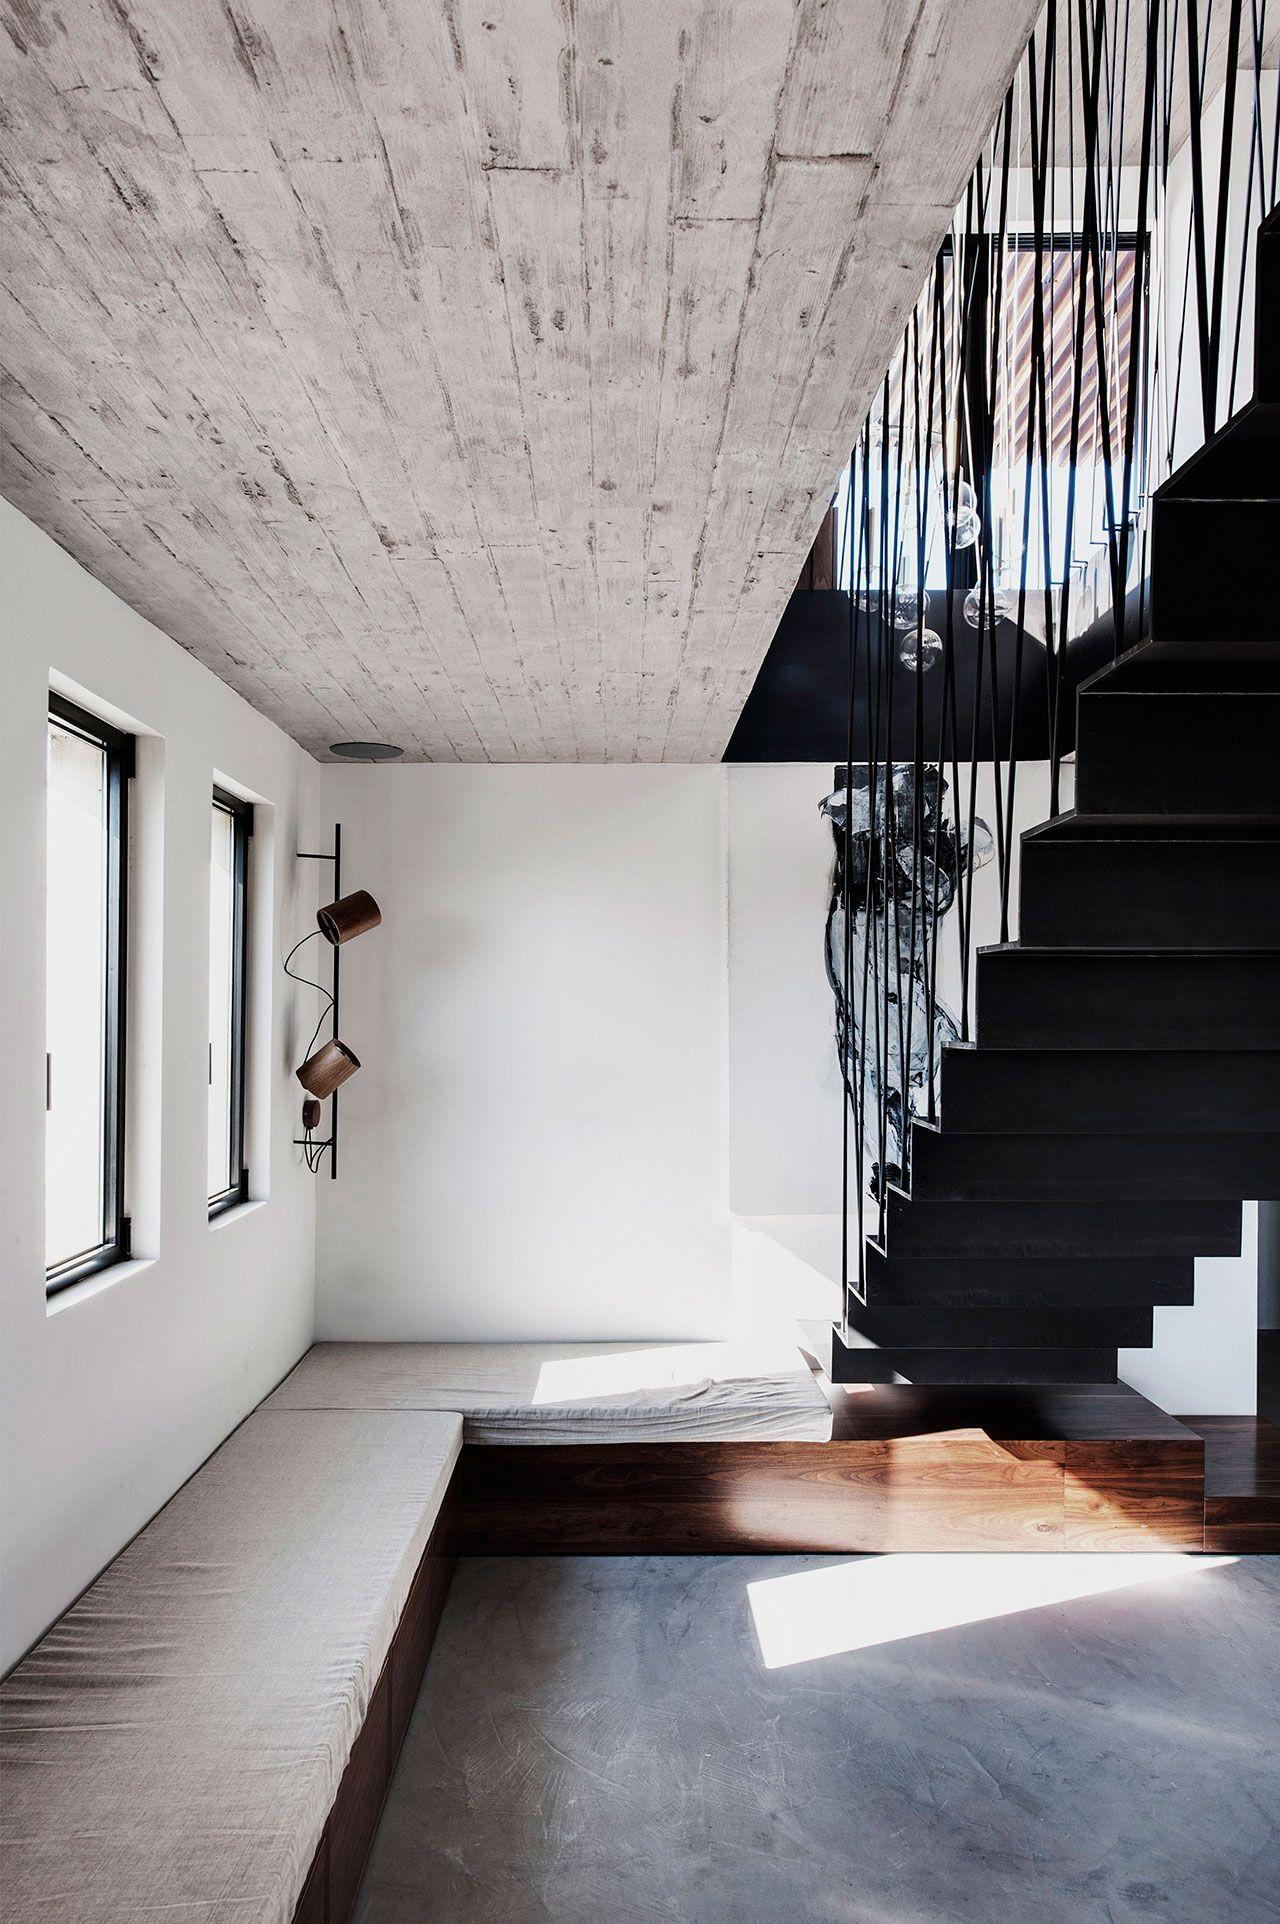 Sitzbank gepolstert Innengestaltung in modernem Stil